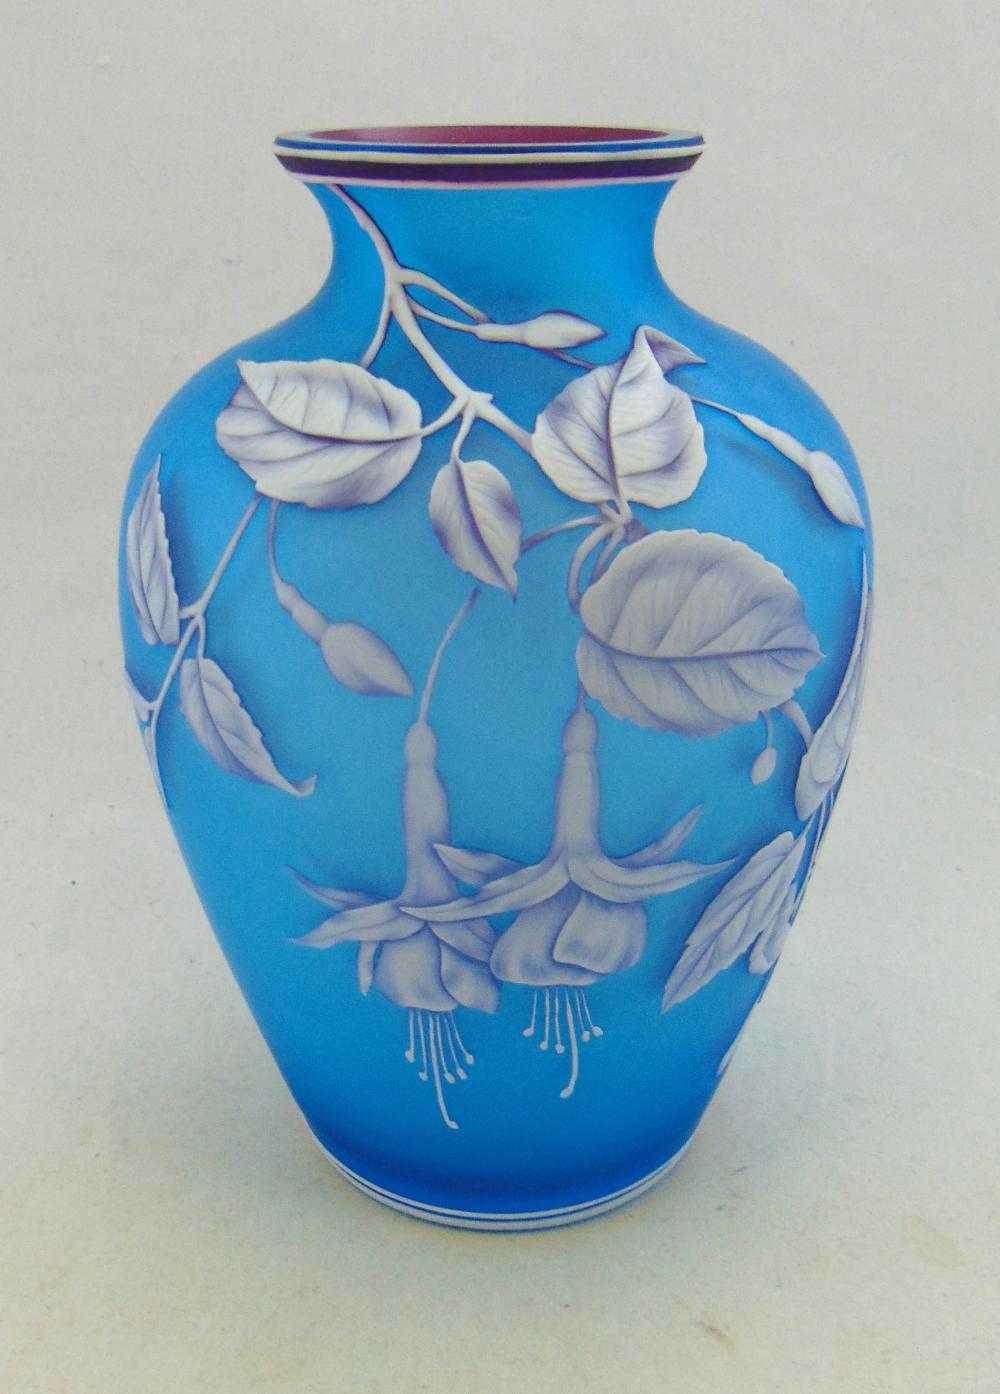 Webb Prussian Blue cameo vase